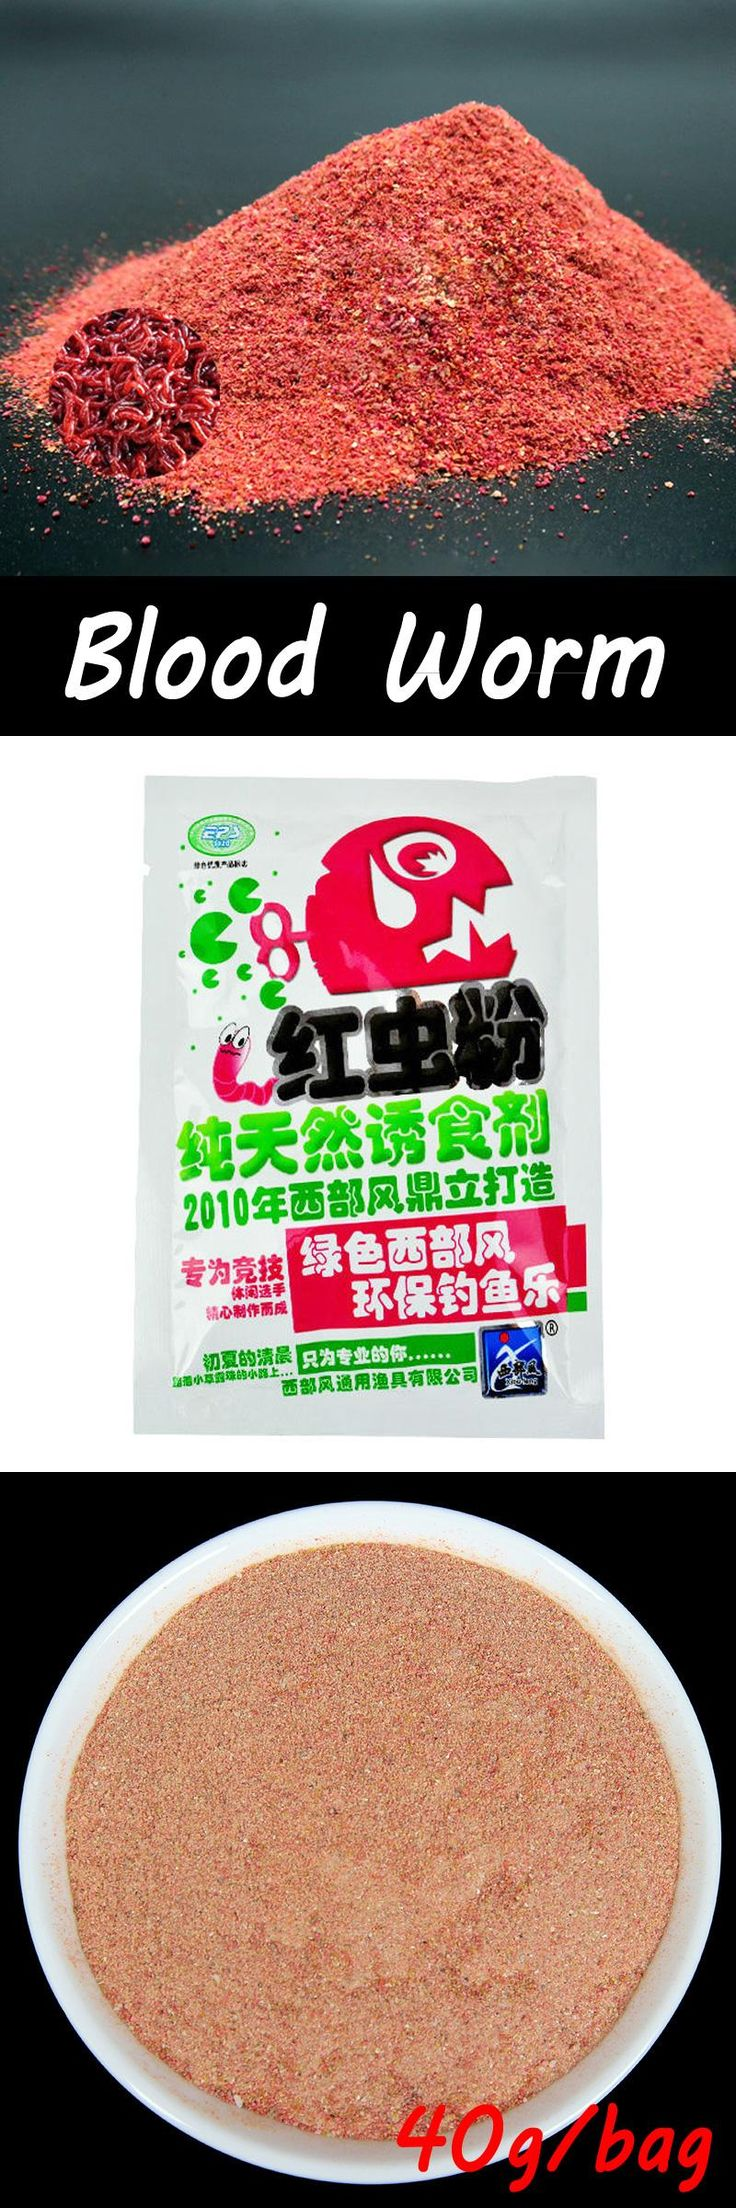 [visit To Buy] 1 Bag 40g Blood Worm Flavor Additive Carp Fishing Feeder Bait